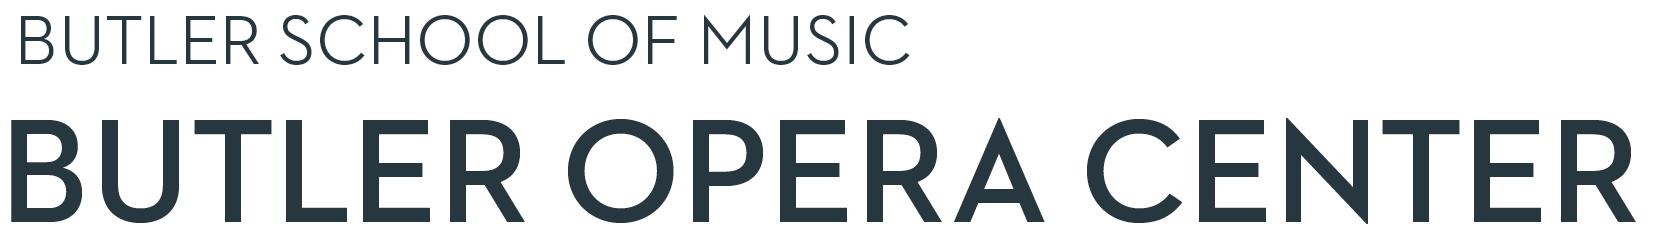 Butler School of Music Butler Opera Center